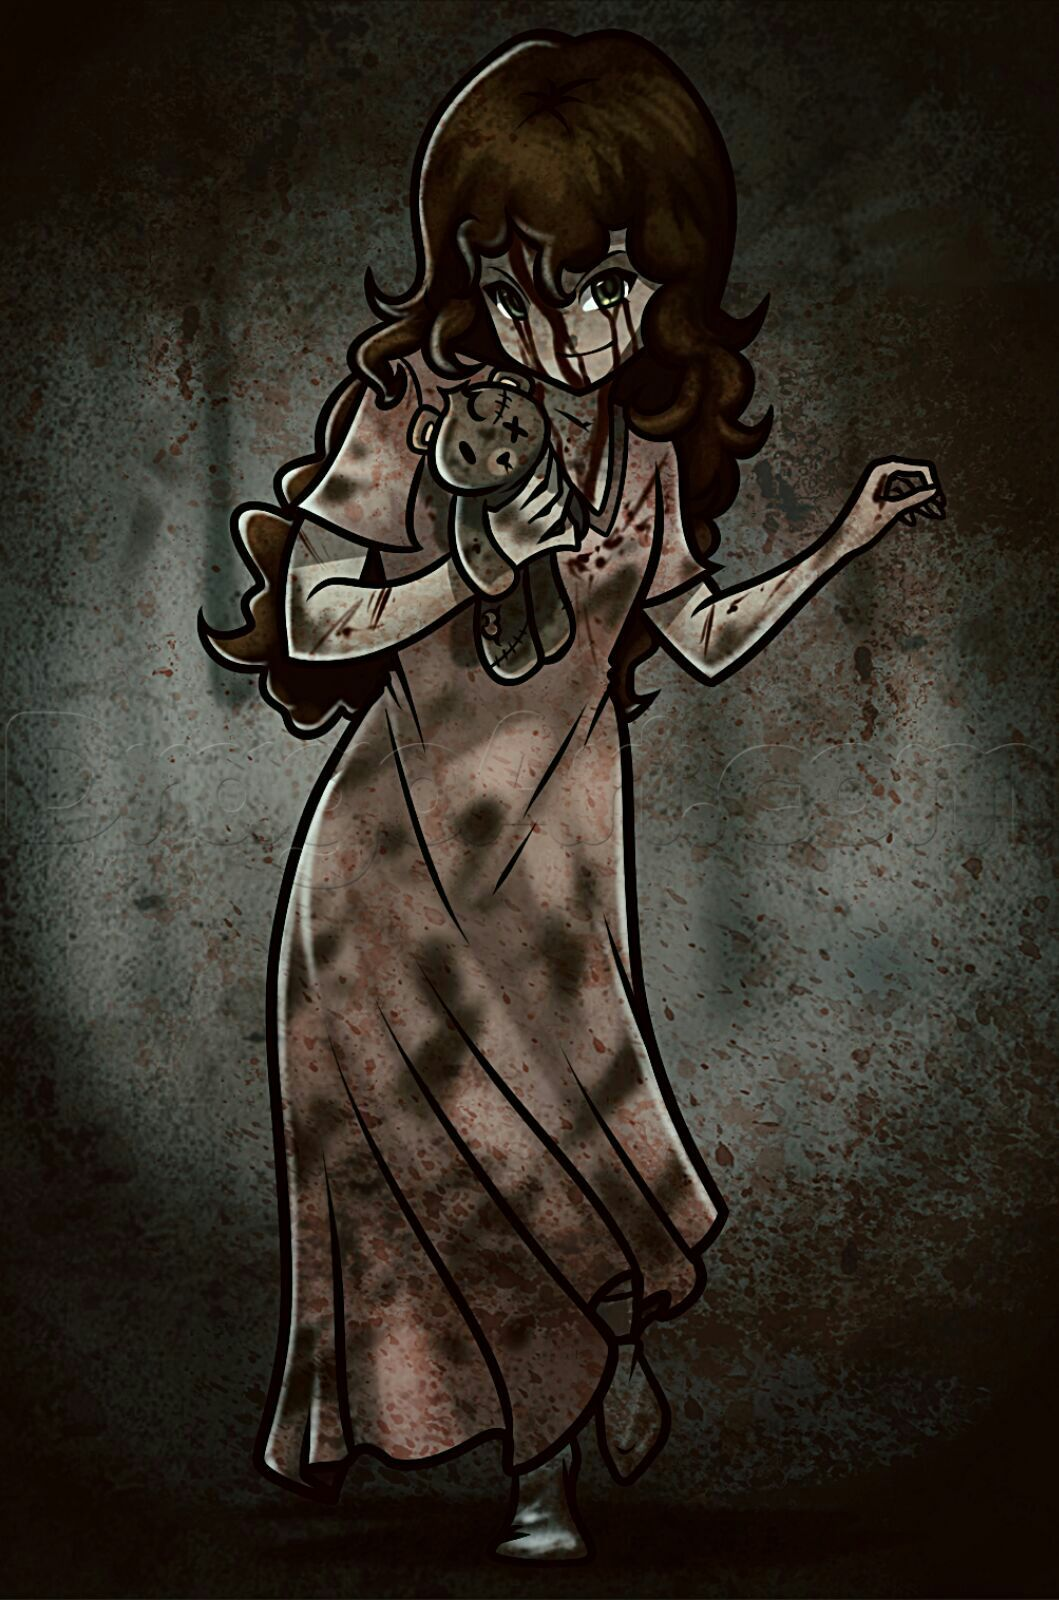 Creepypasta stories - Sally X Reader Lemon - Wattpad